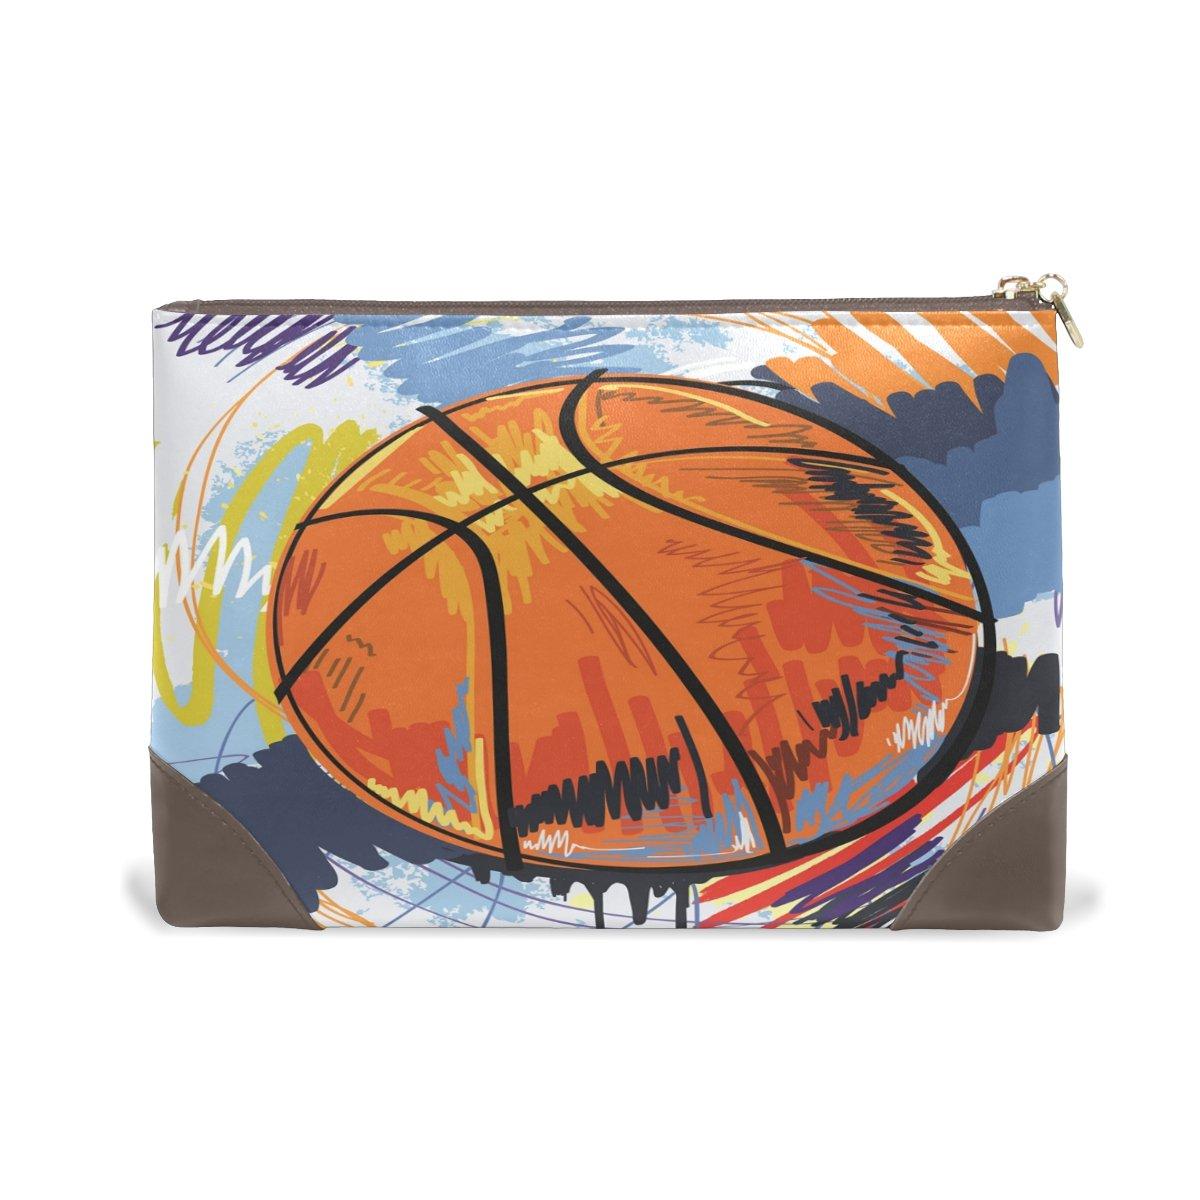 Women Makeup Bag Art Basketball Genuine Leather Zipper Cosmetics Pouch Lady Toiletry Bag